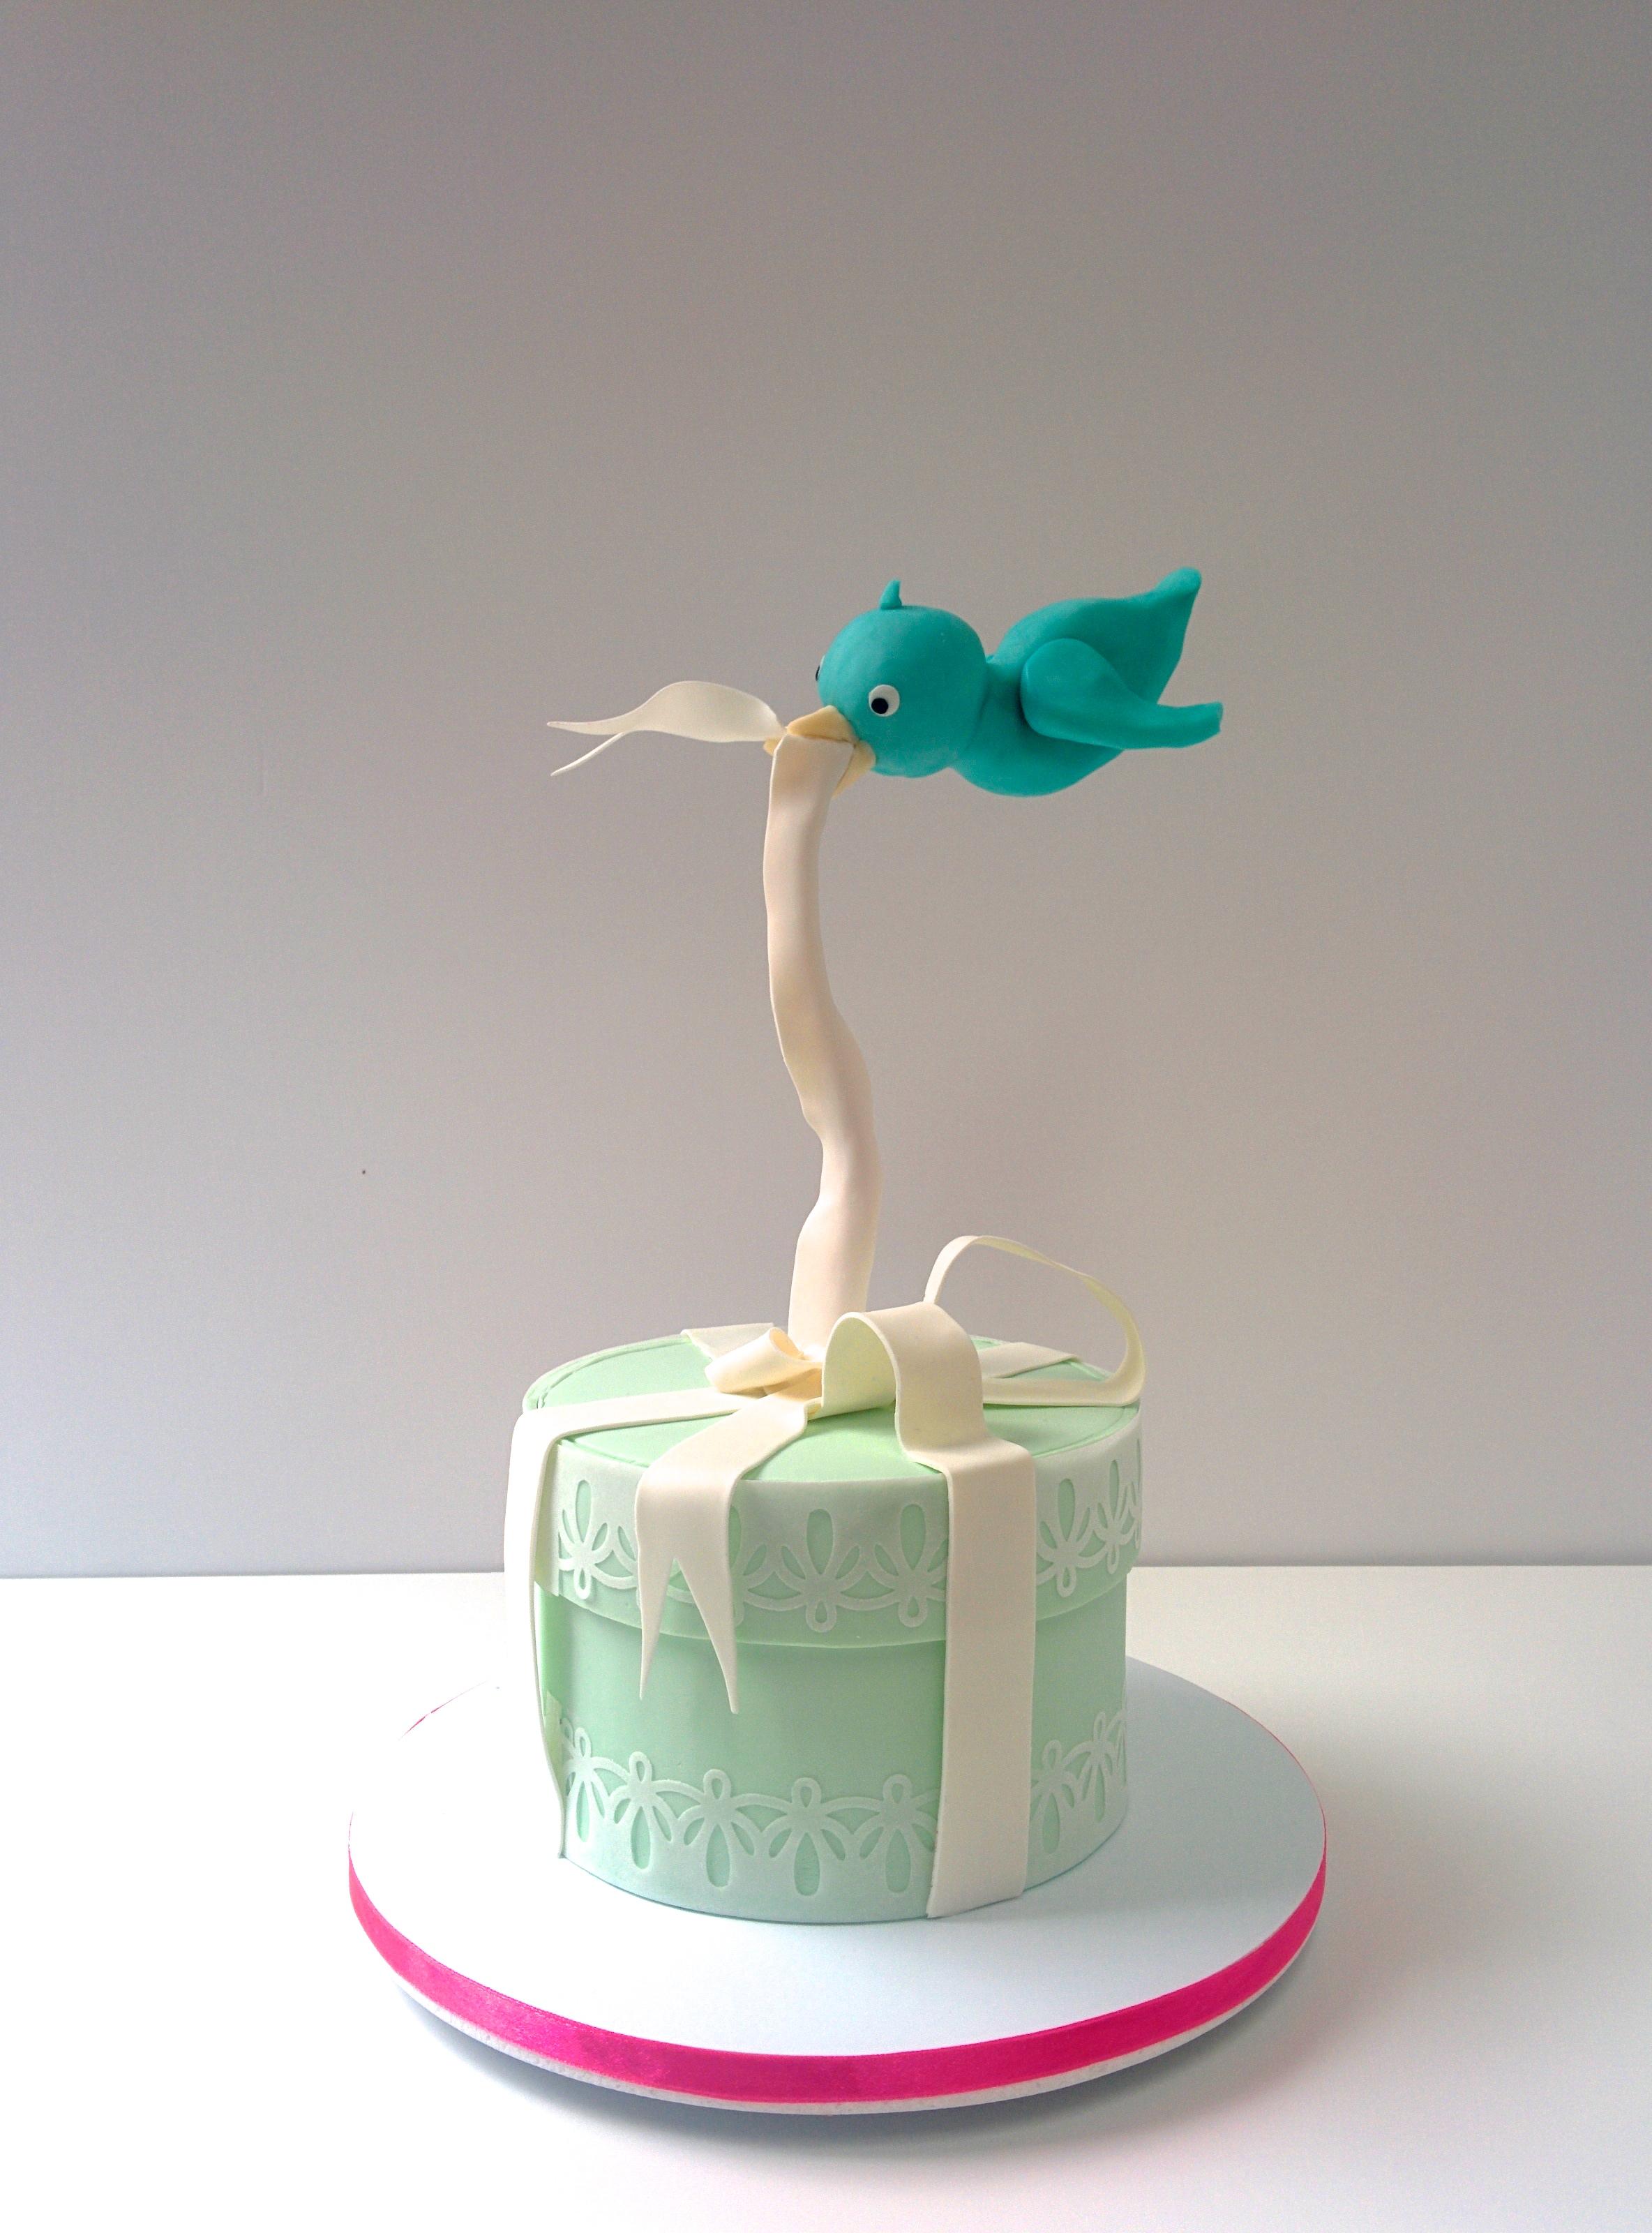 Gravity defying blue bird and ribbon cake